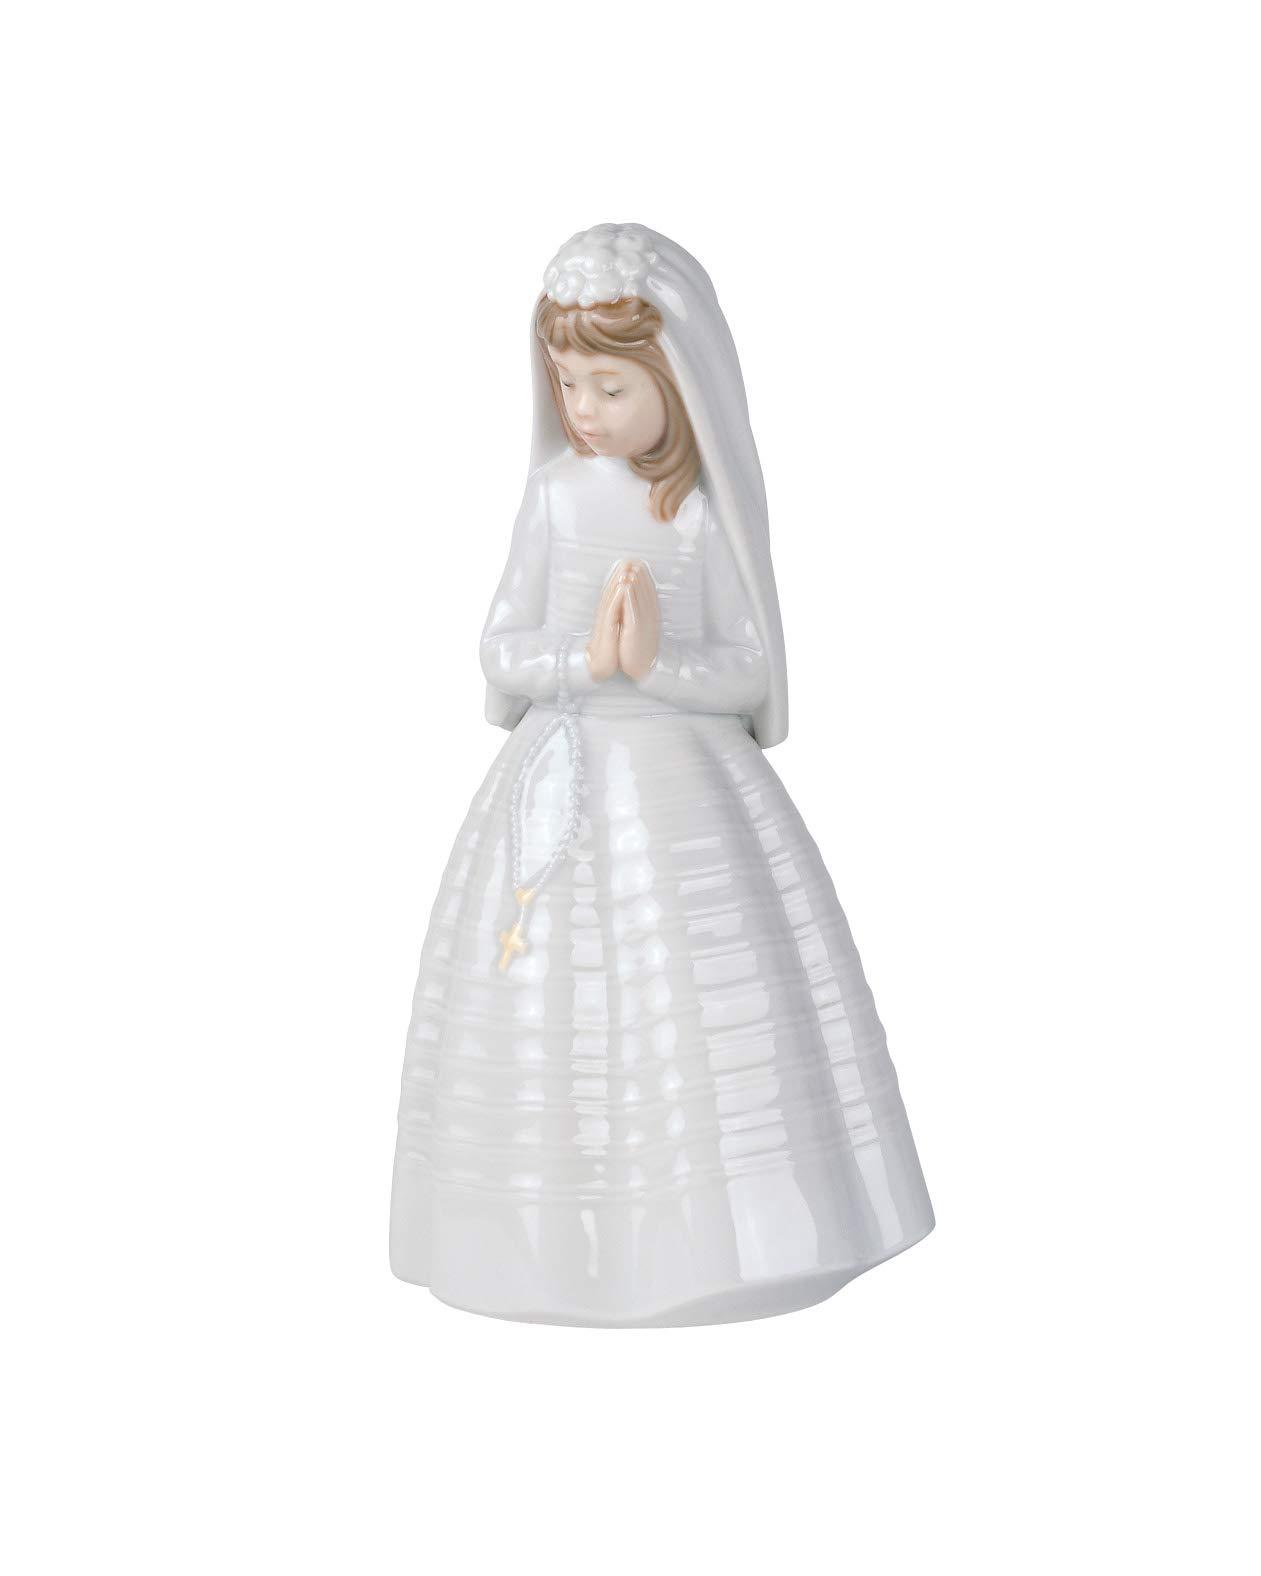 NAO Girl Praying. Porcelain Communion Figure.